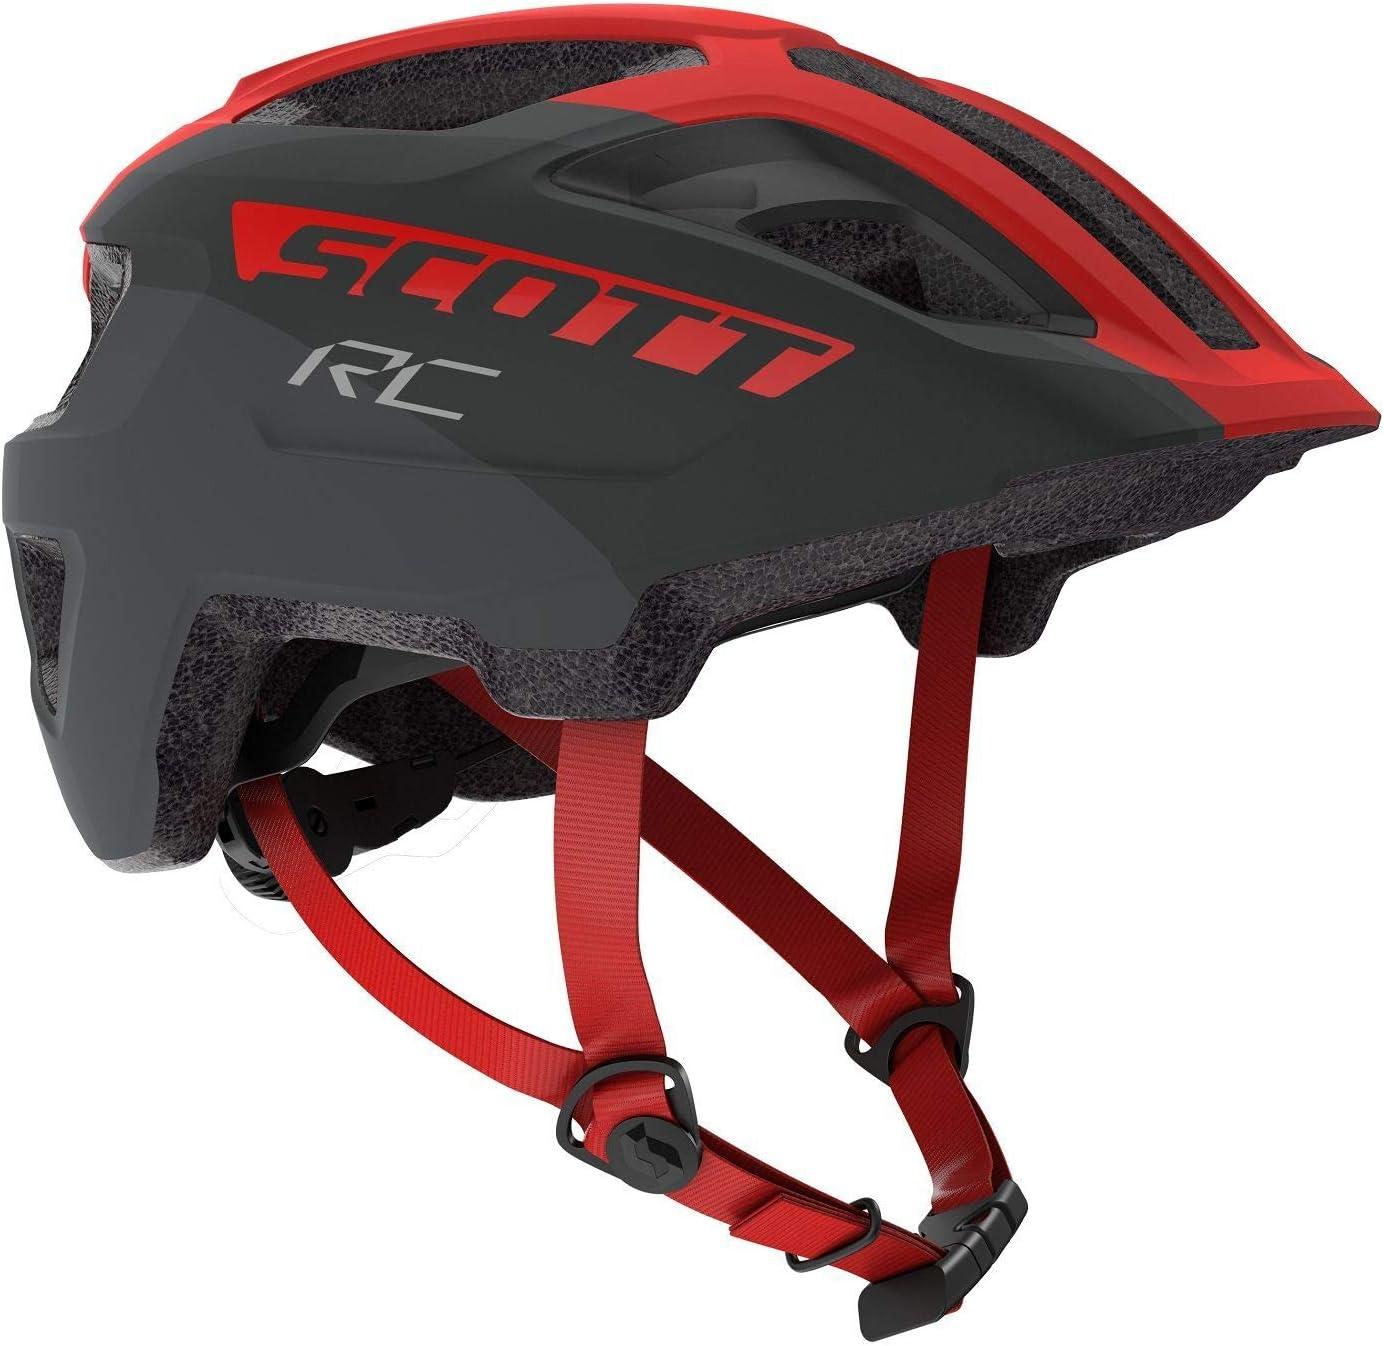 Scott 275232 - Casco de Bicicleta Unisex para niño, Color Gris y ...